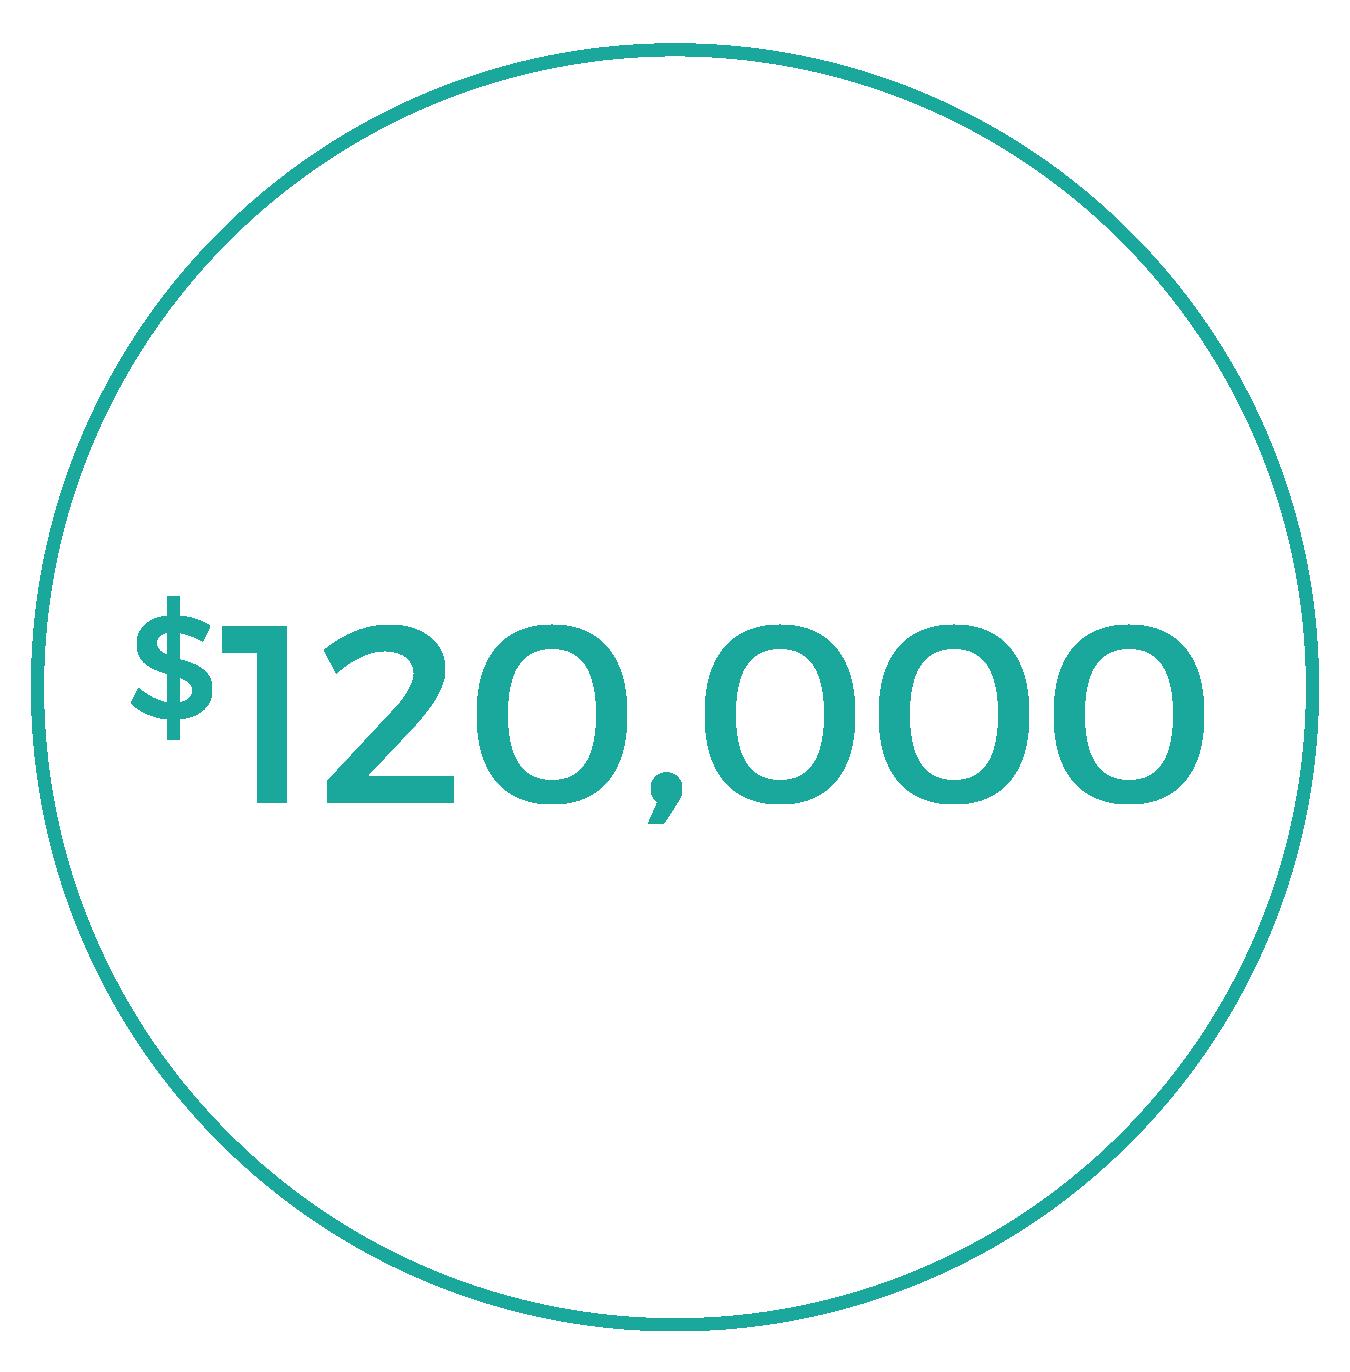 $120,000